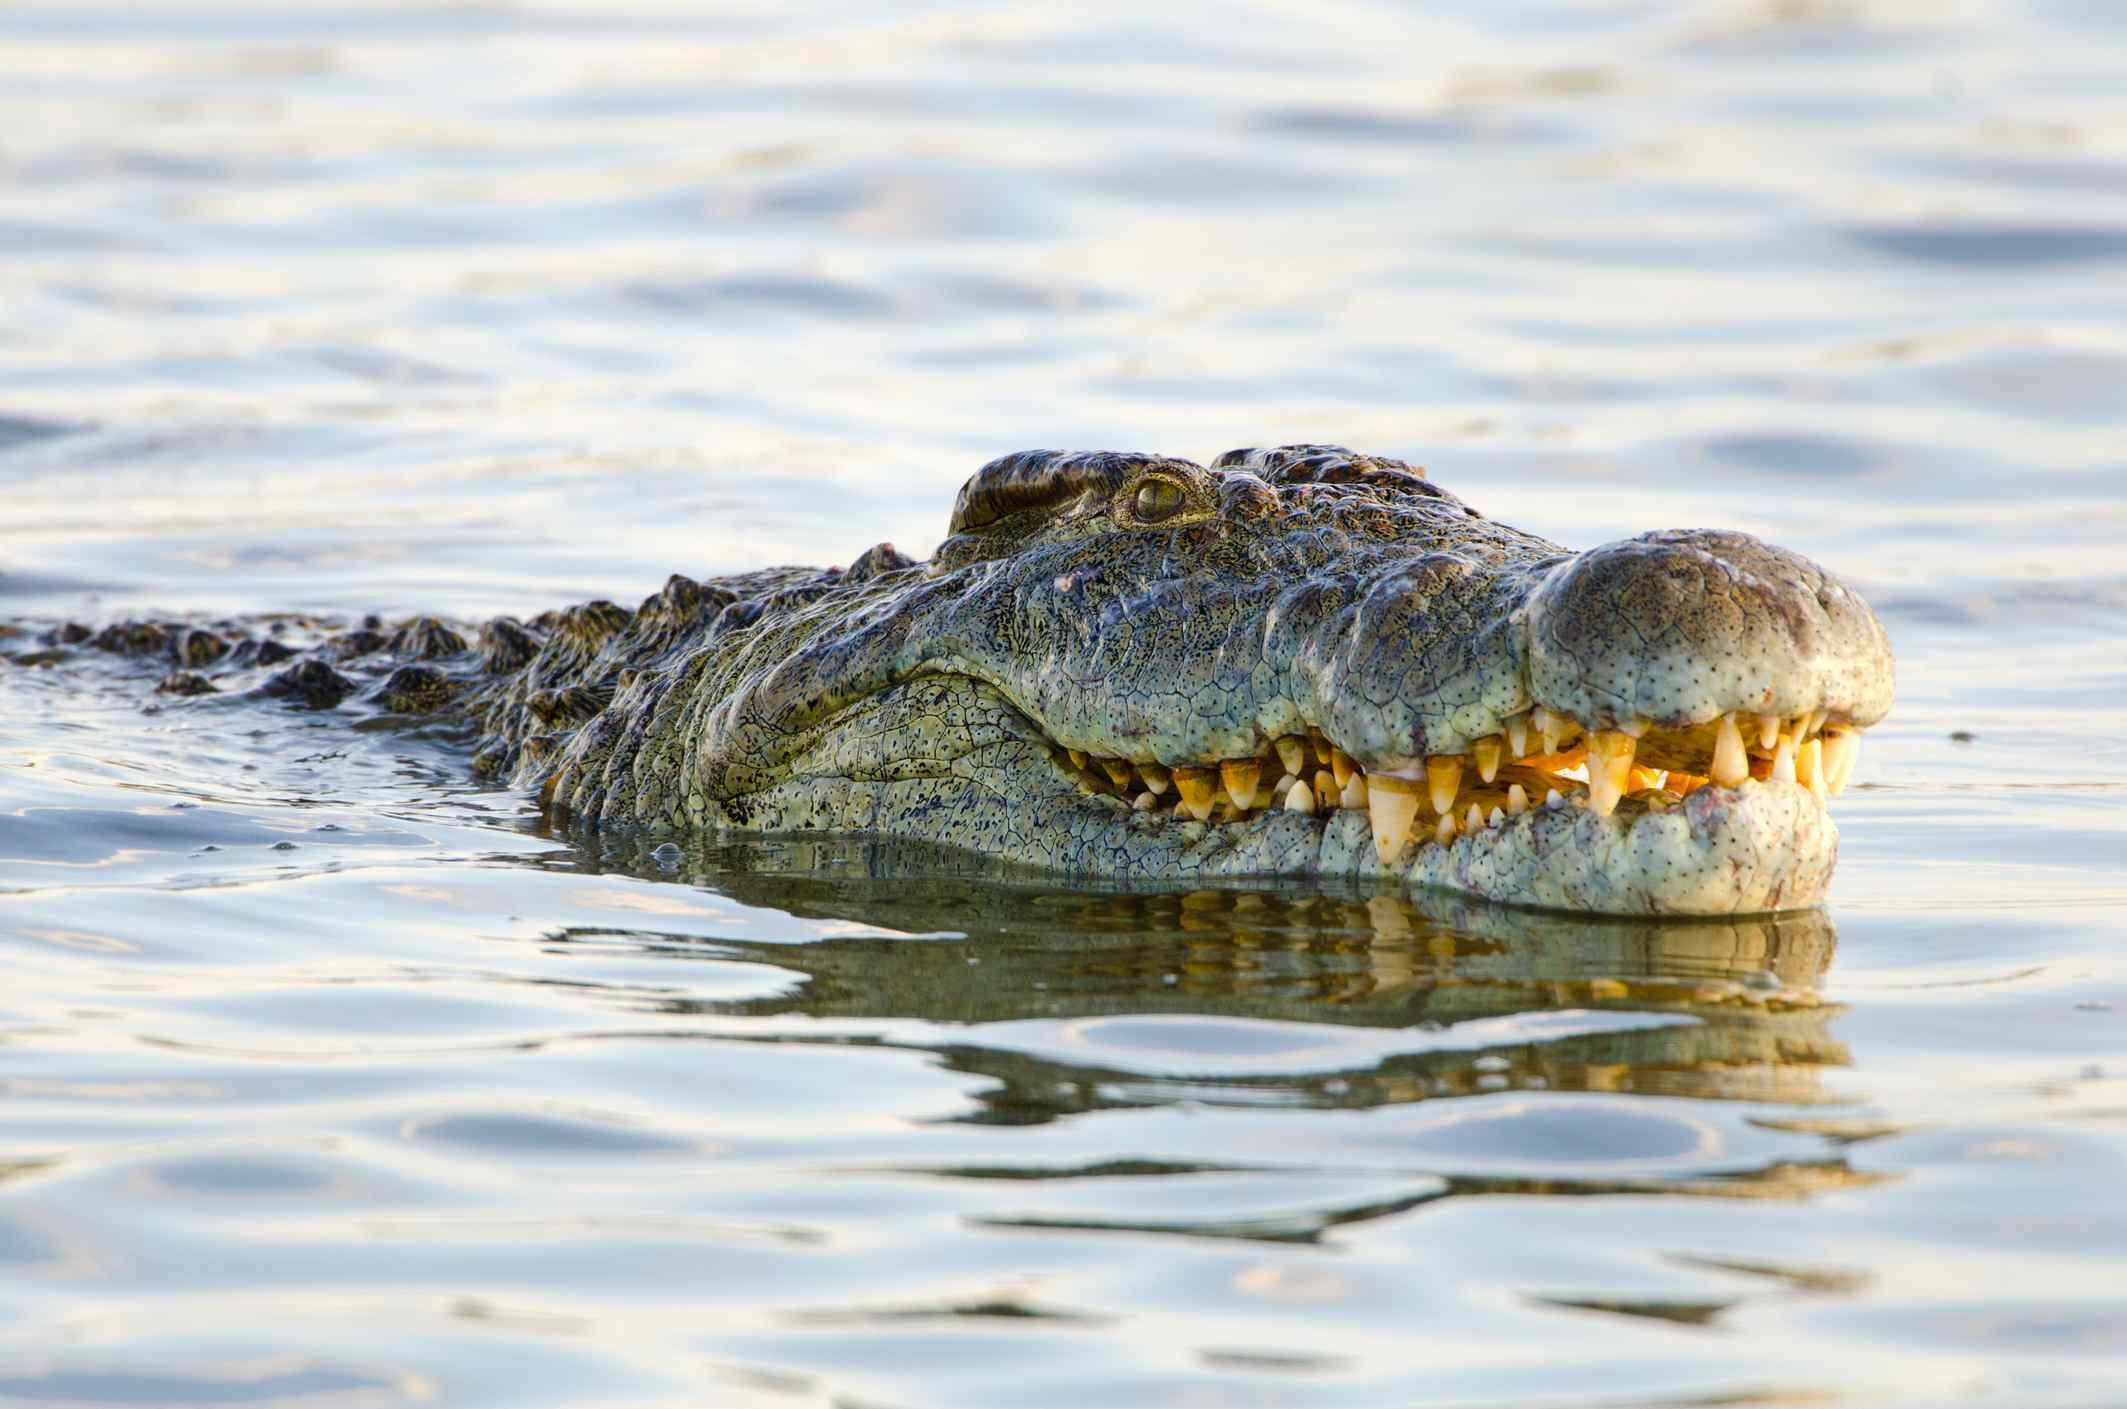 Giraffe Facts Habitat, Behavior, Diet Crocodiles